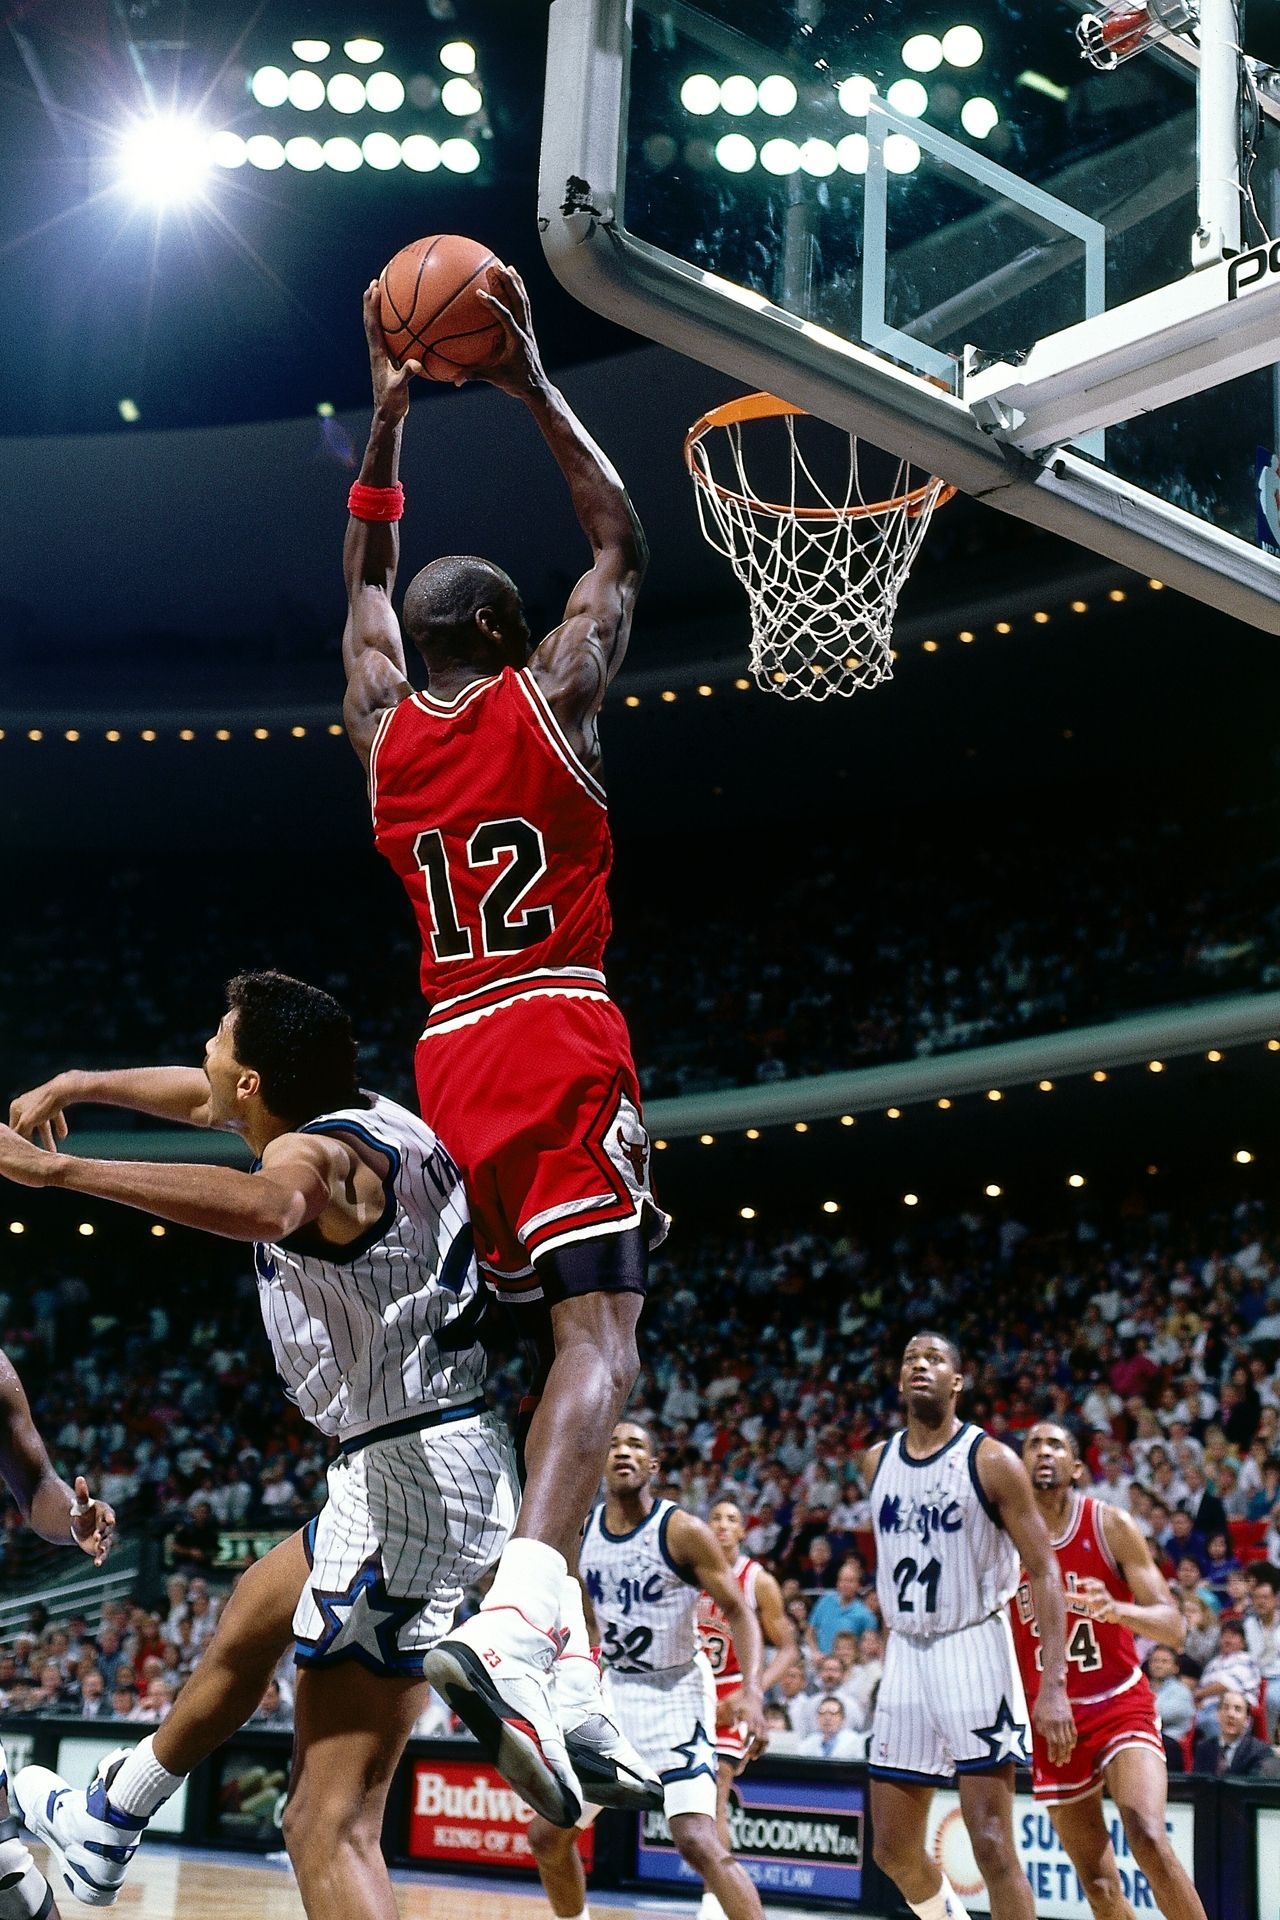 def912701a7 Michael Jordan's Valentine's Day Jersey. Someone stole his #23. Michael  Jordan 12,